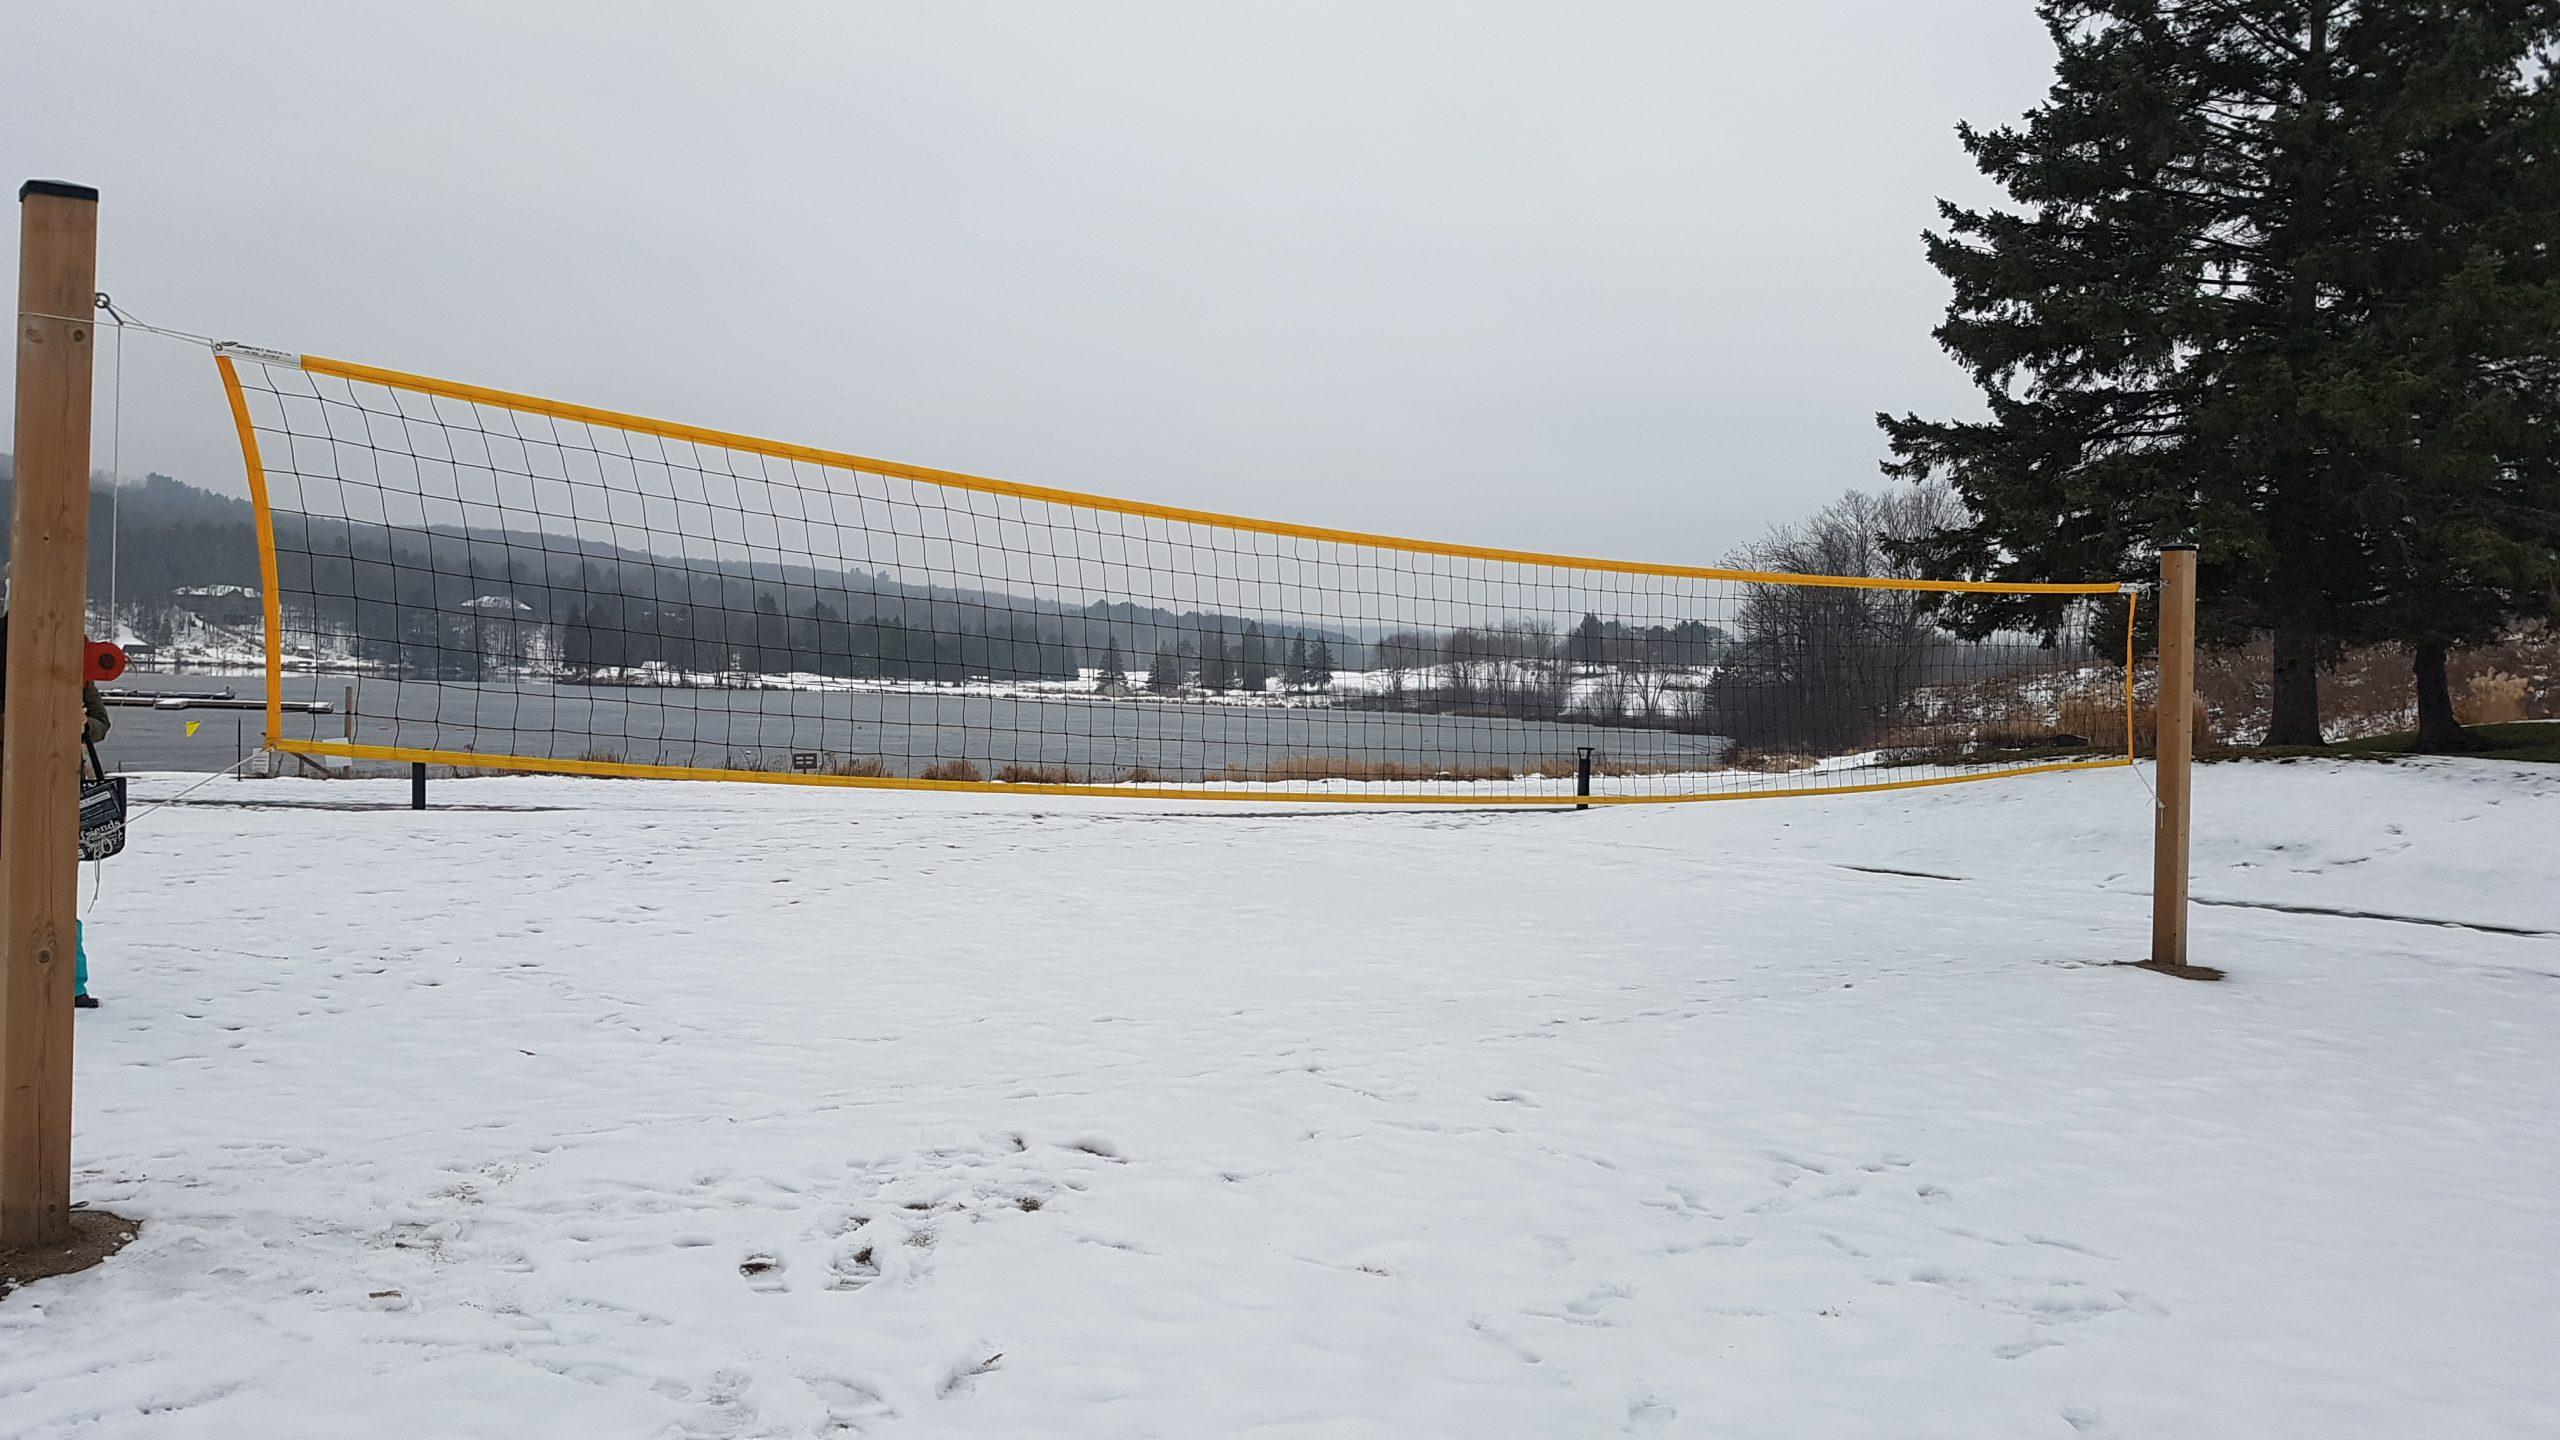 Volleyball Court while exploring Deerhurst Resort, Muskoka